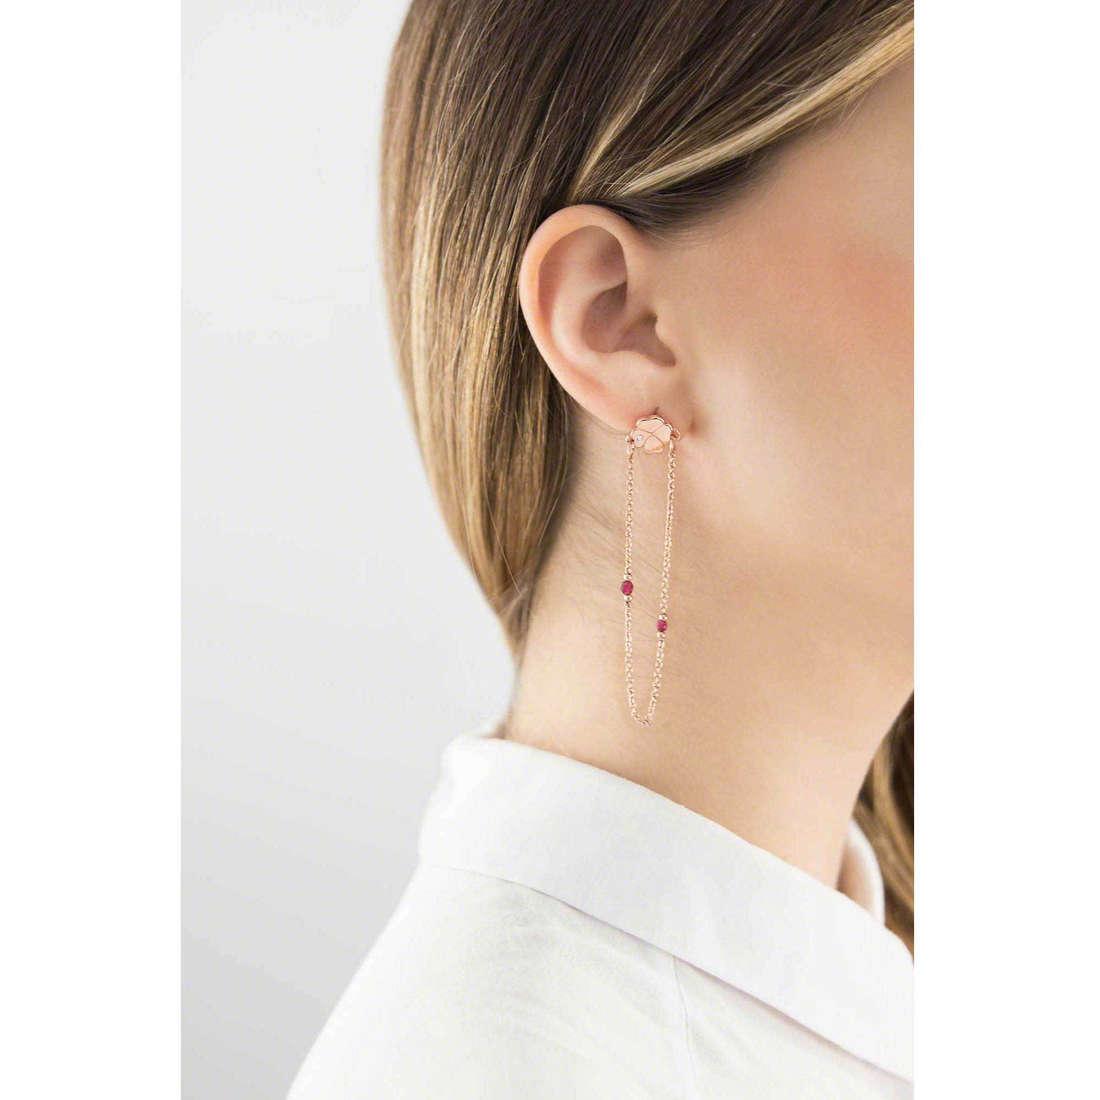 Marlù boucles d'oreille Clover femme 18OR020R indosso